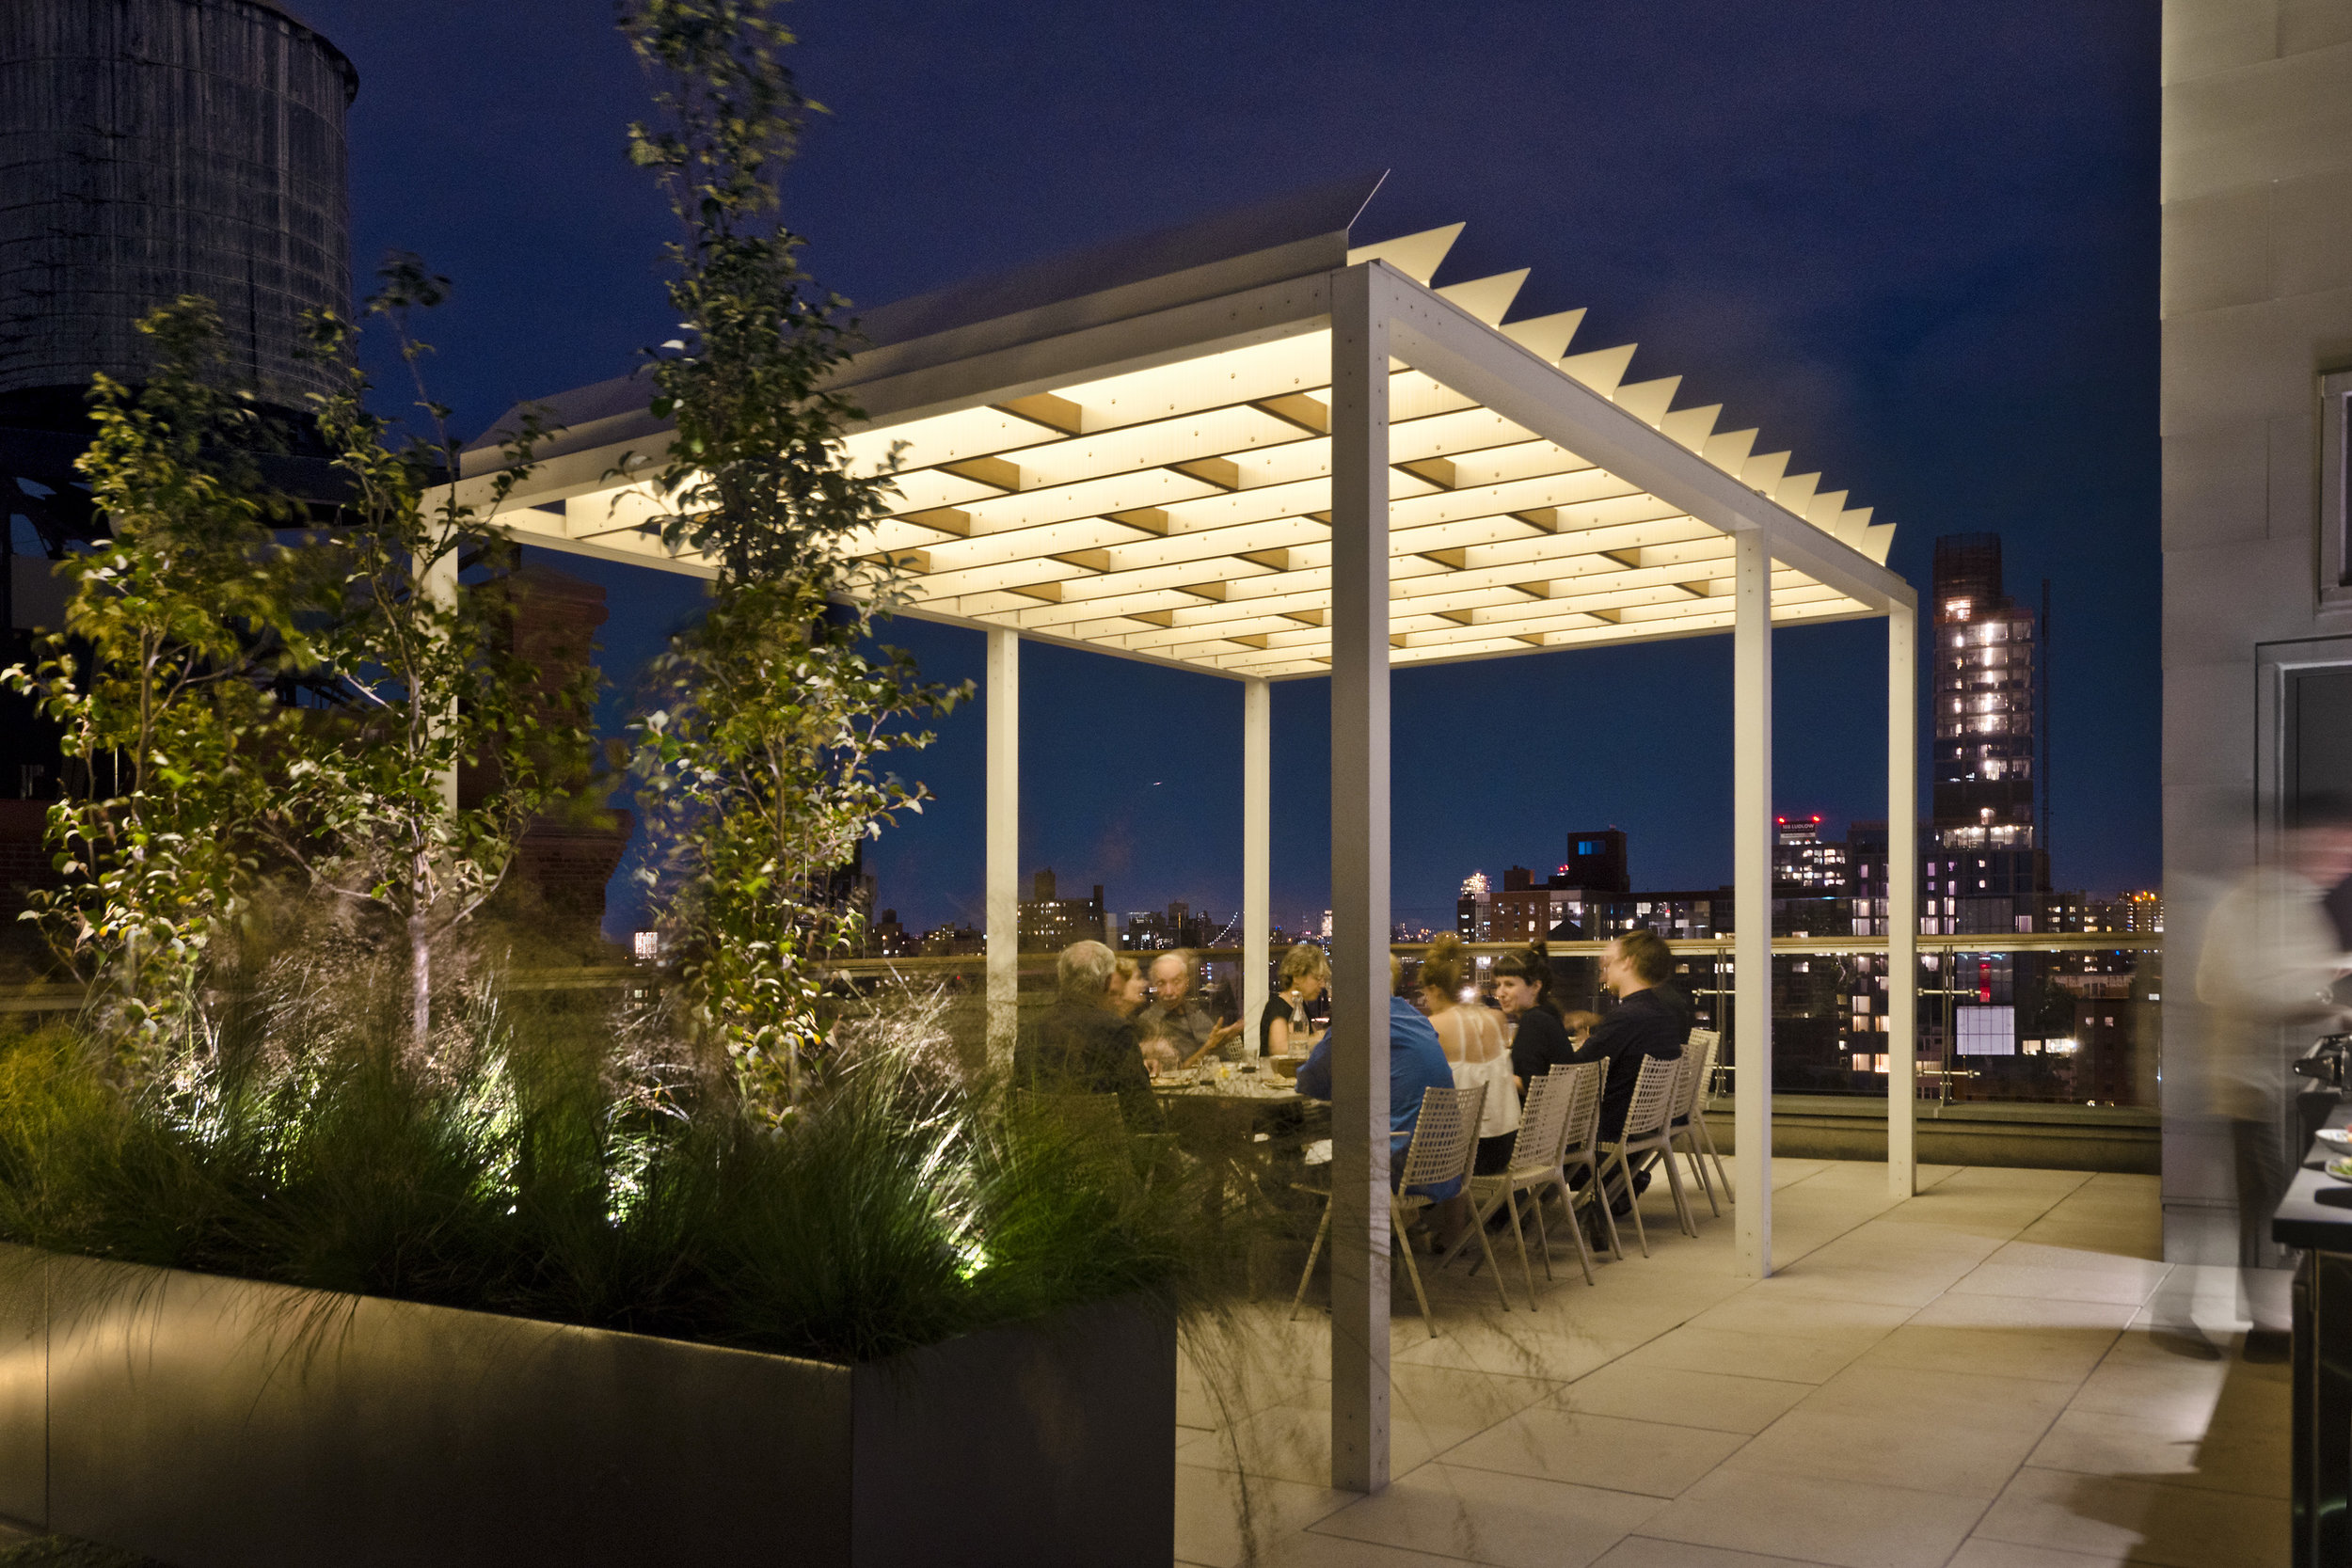 ACHA, Roof Terrace, 285 Lafayette Street,SoHo, NYC